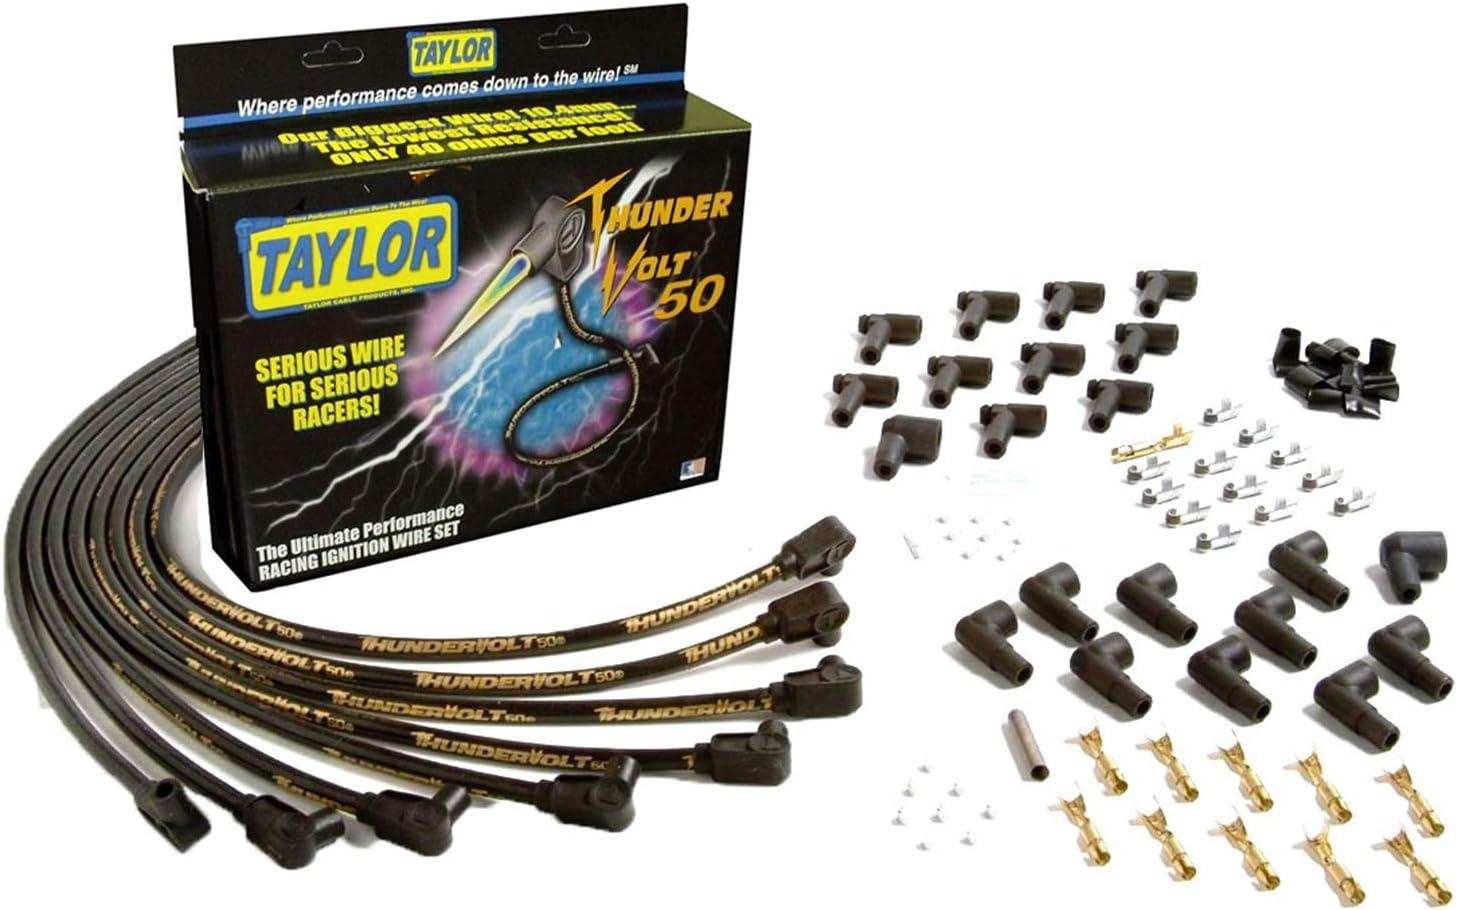 Taylor 98051 ThunderVolt 90/° Universal Fit Ignition Wire Set